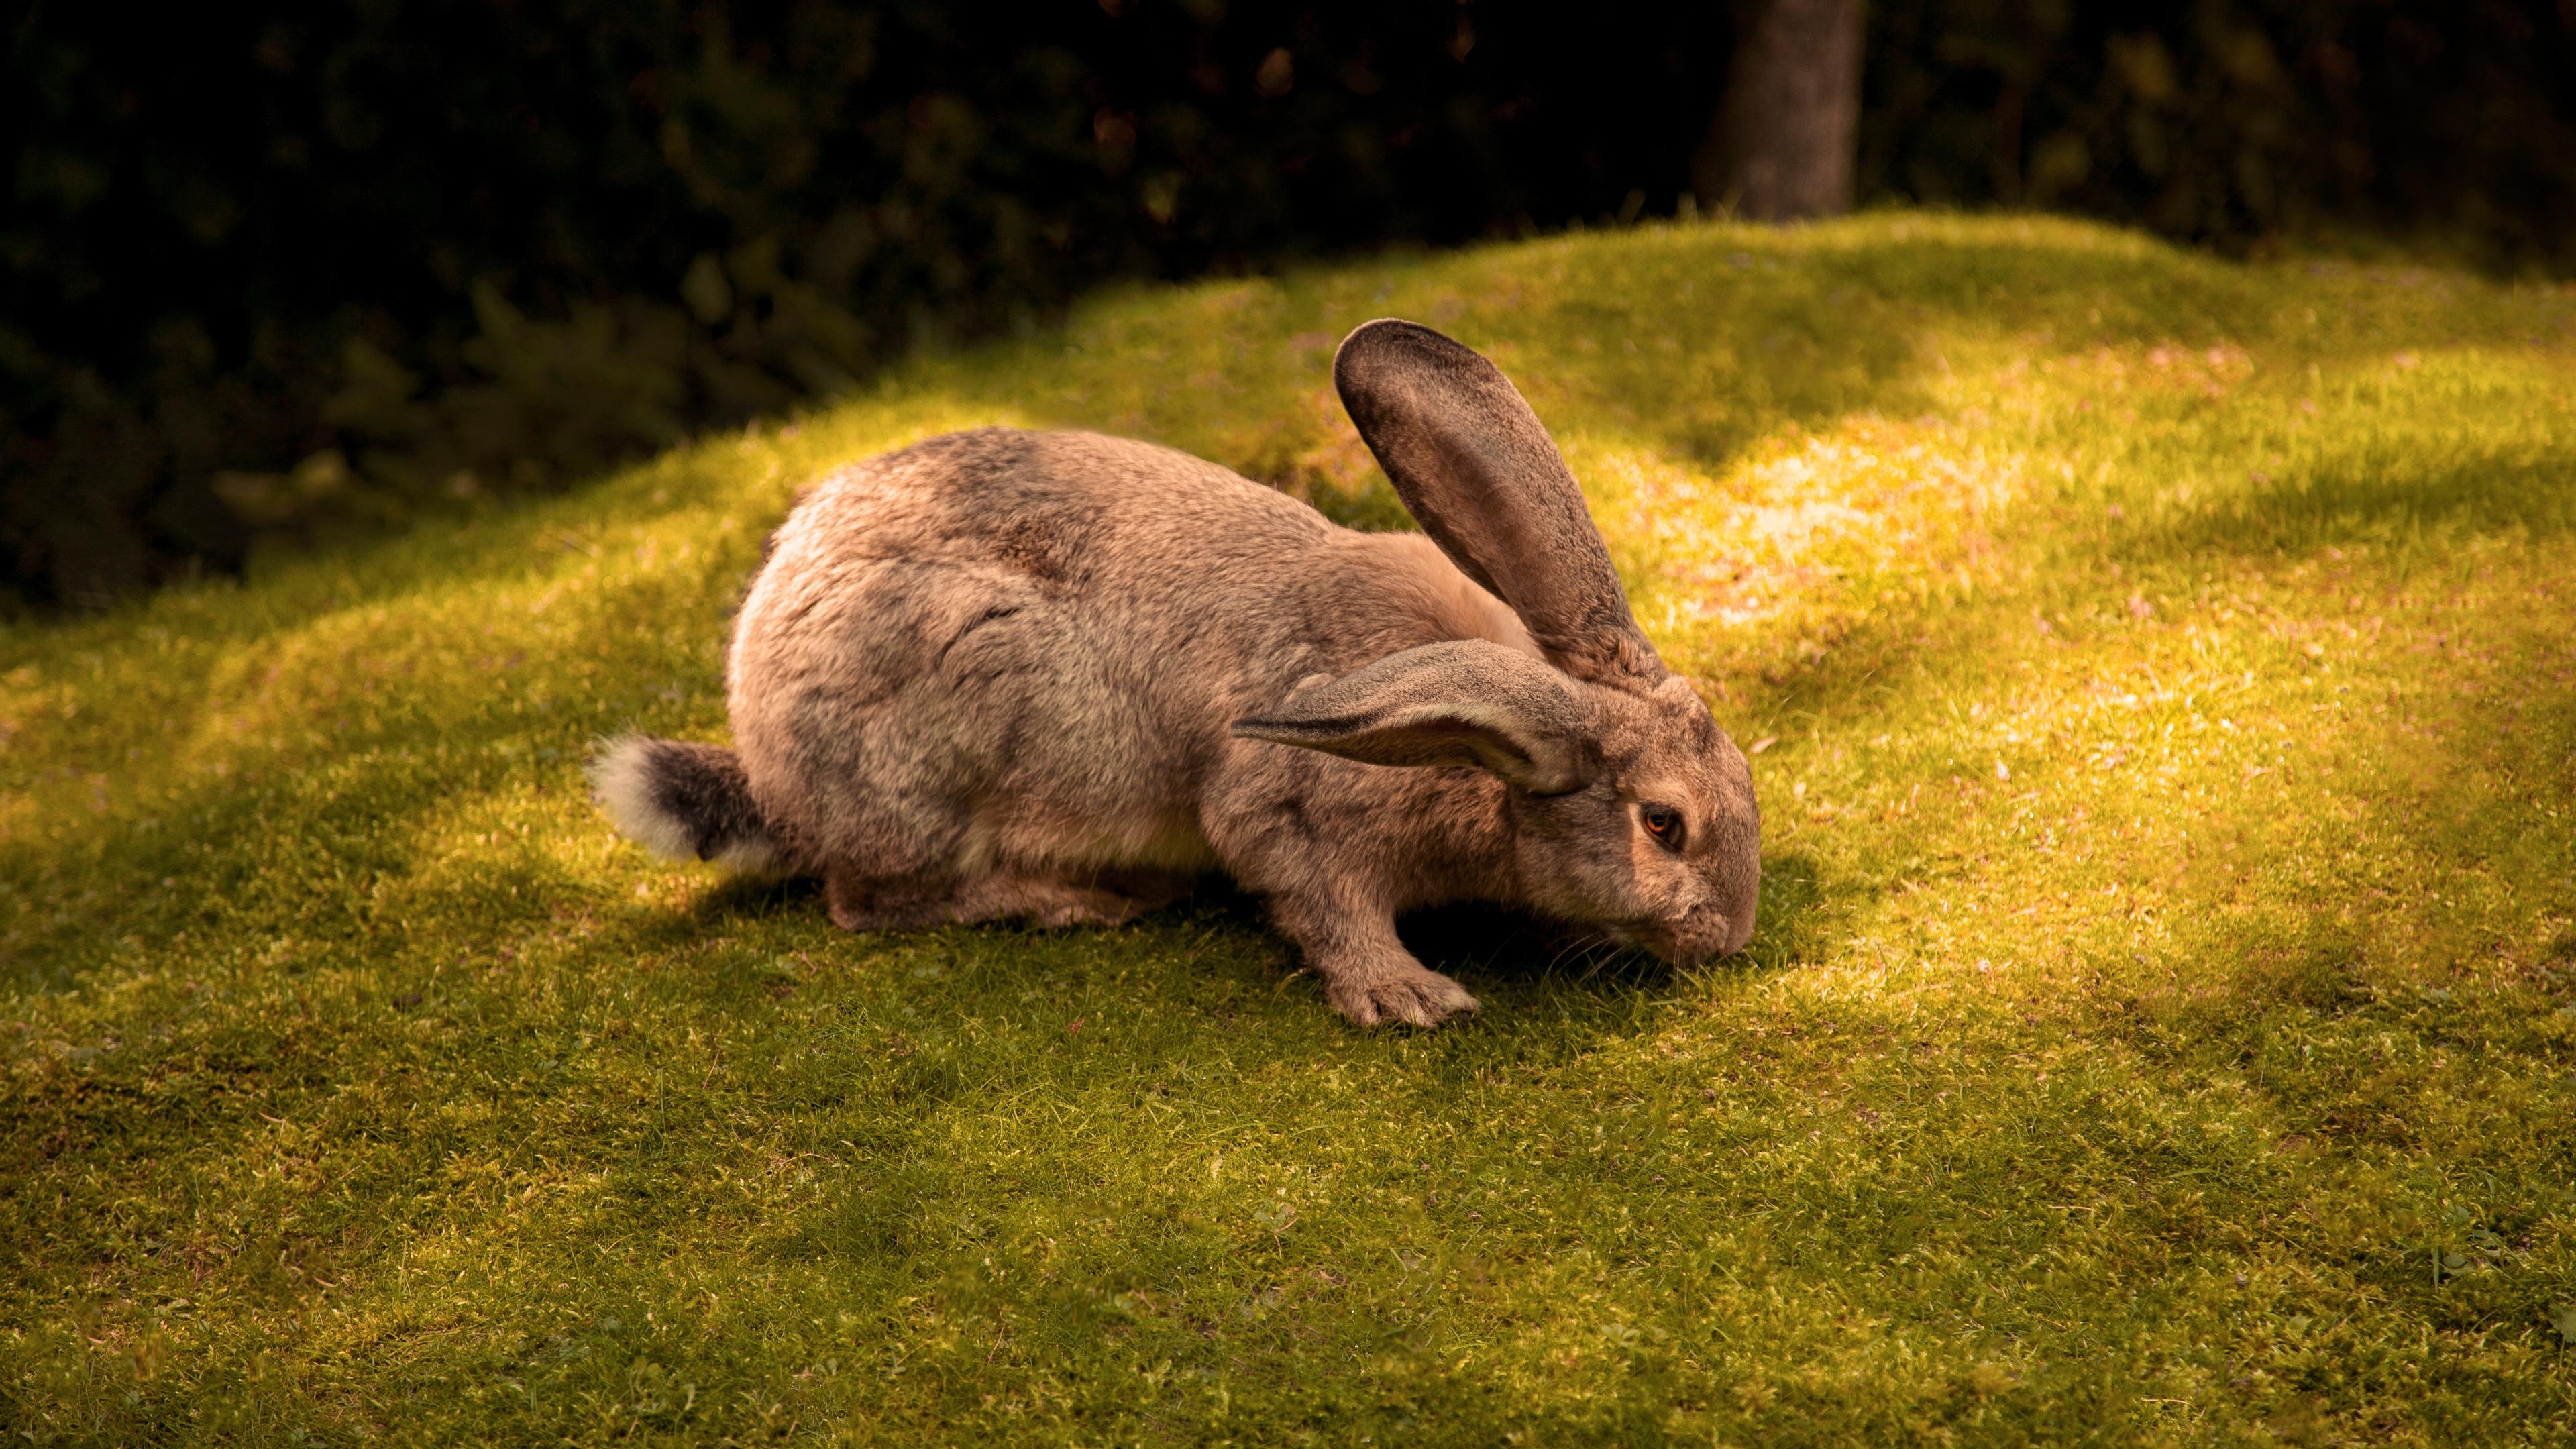 rabbit 4k 1542239654 - Rabbit 4k - rabbit wallpapers, hd-wallpapers, animals wallpapers, 4k-wallpapers